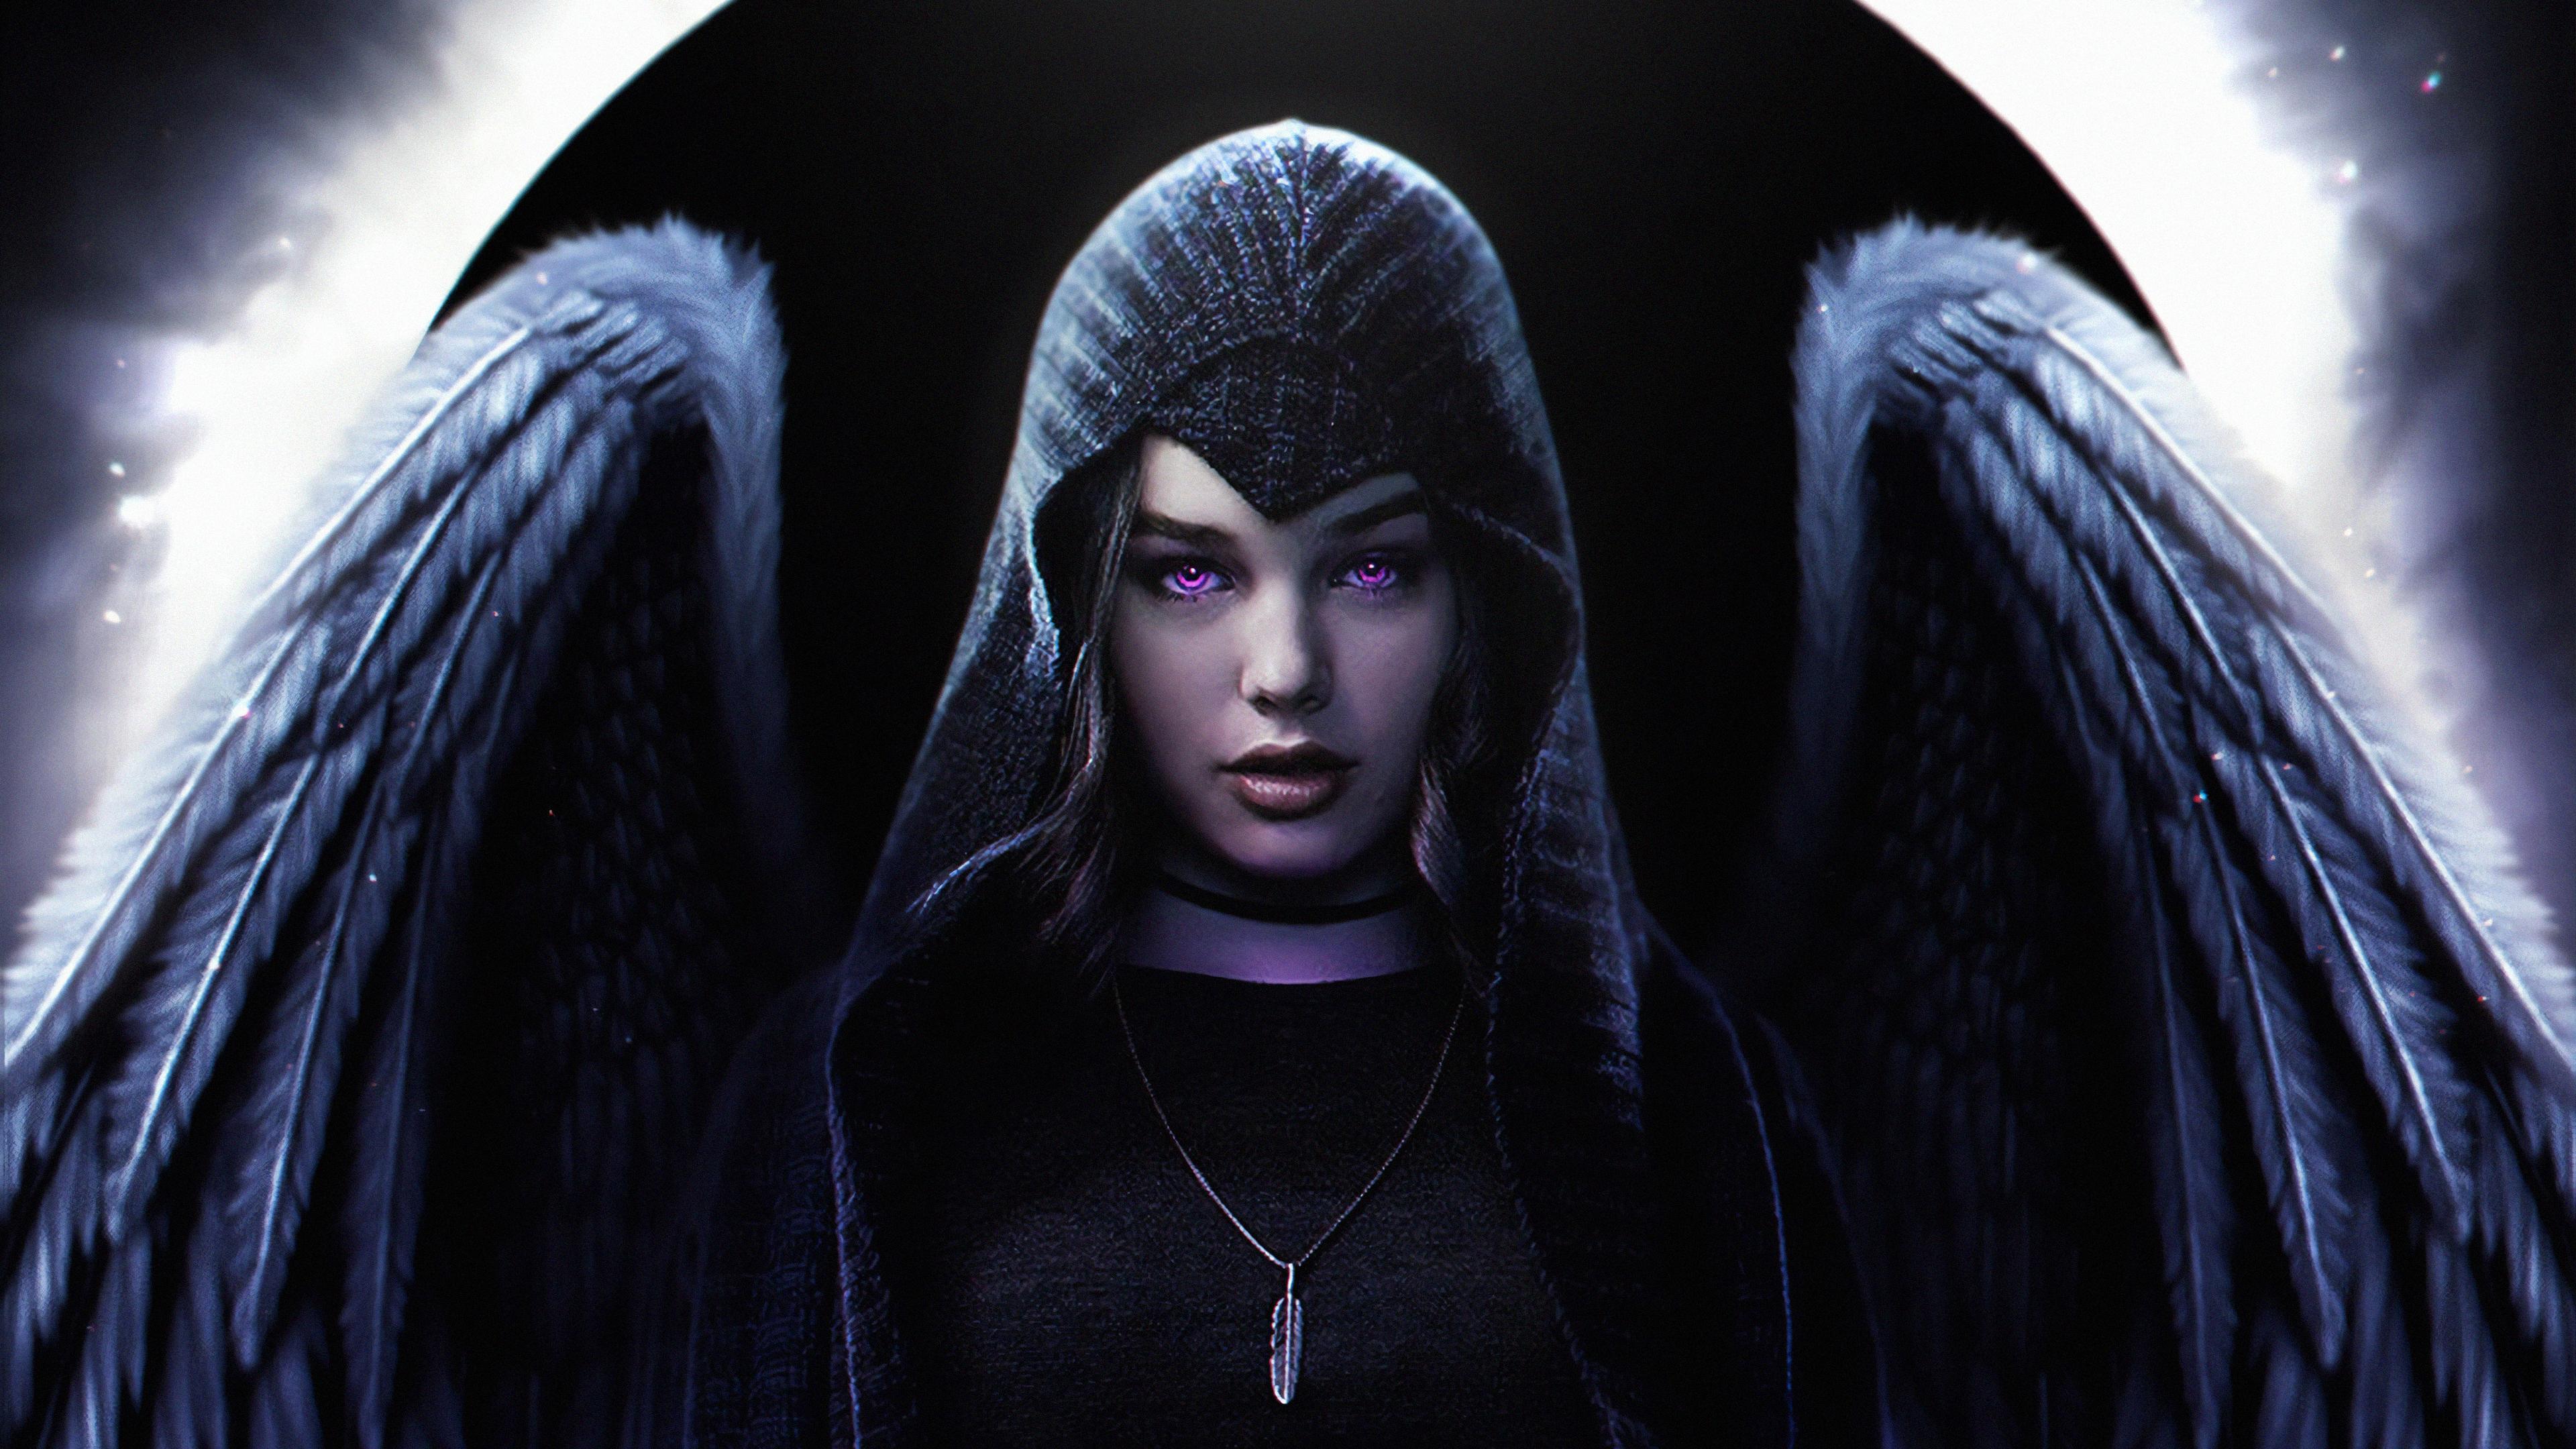 Raven Teen Titans Teagan Croft DC Universe 3840x2160